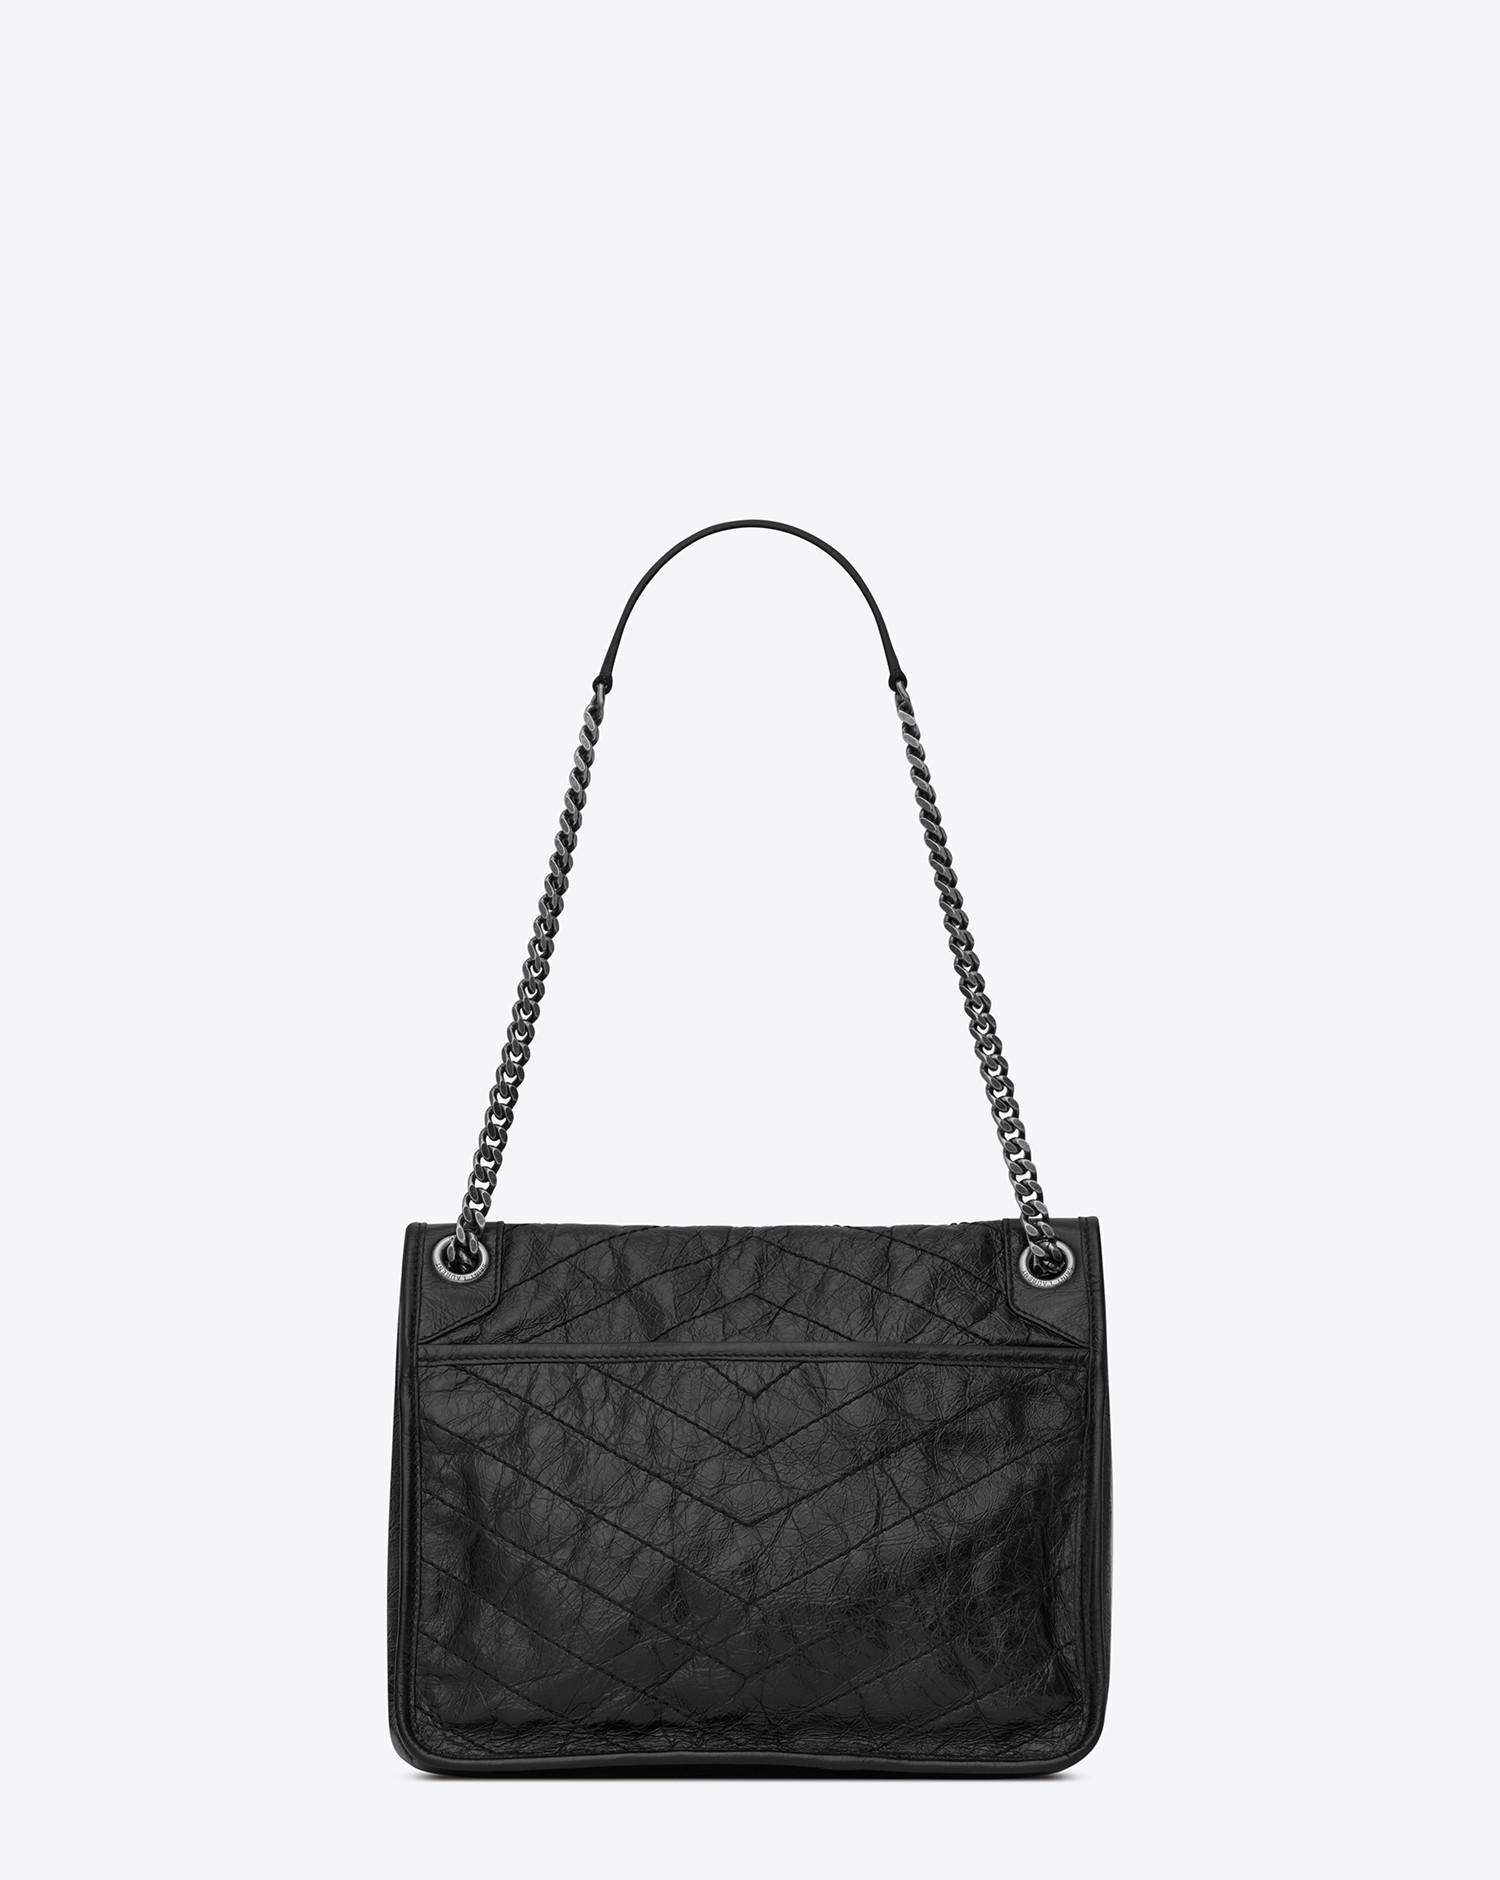 bffa7b0117 Saint Laurent Niki Bags in Black - Lyst